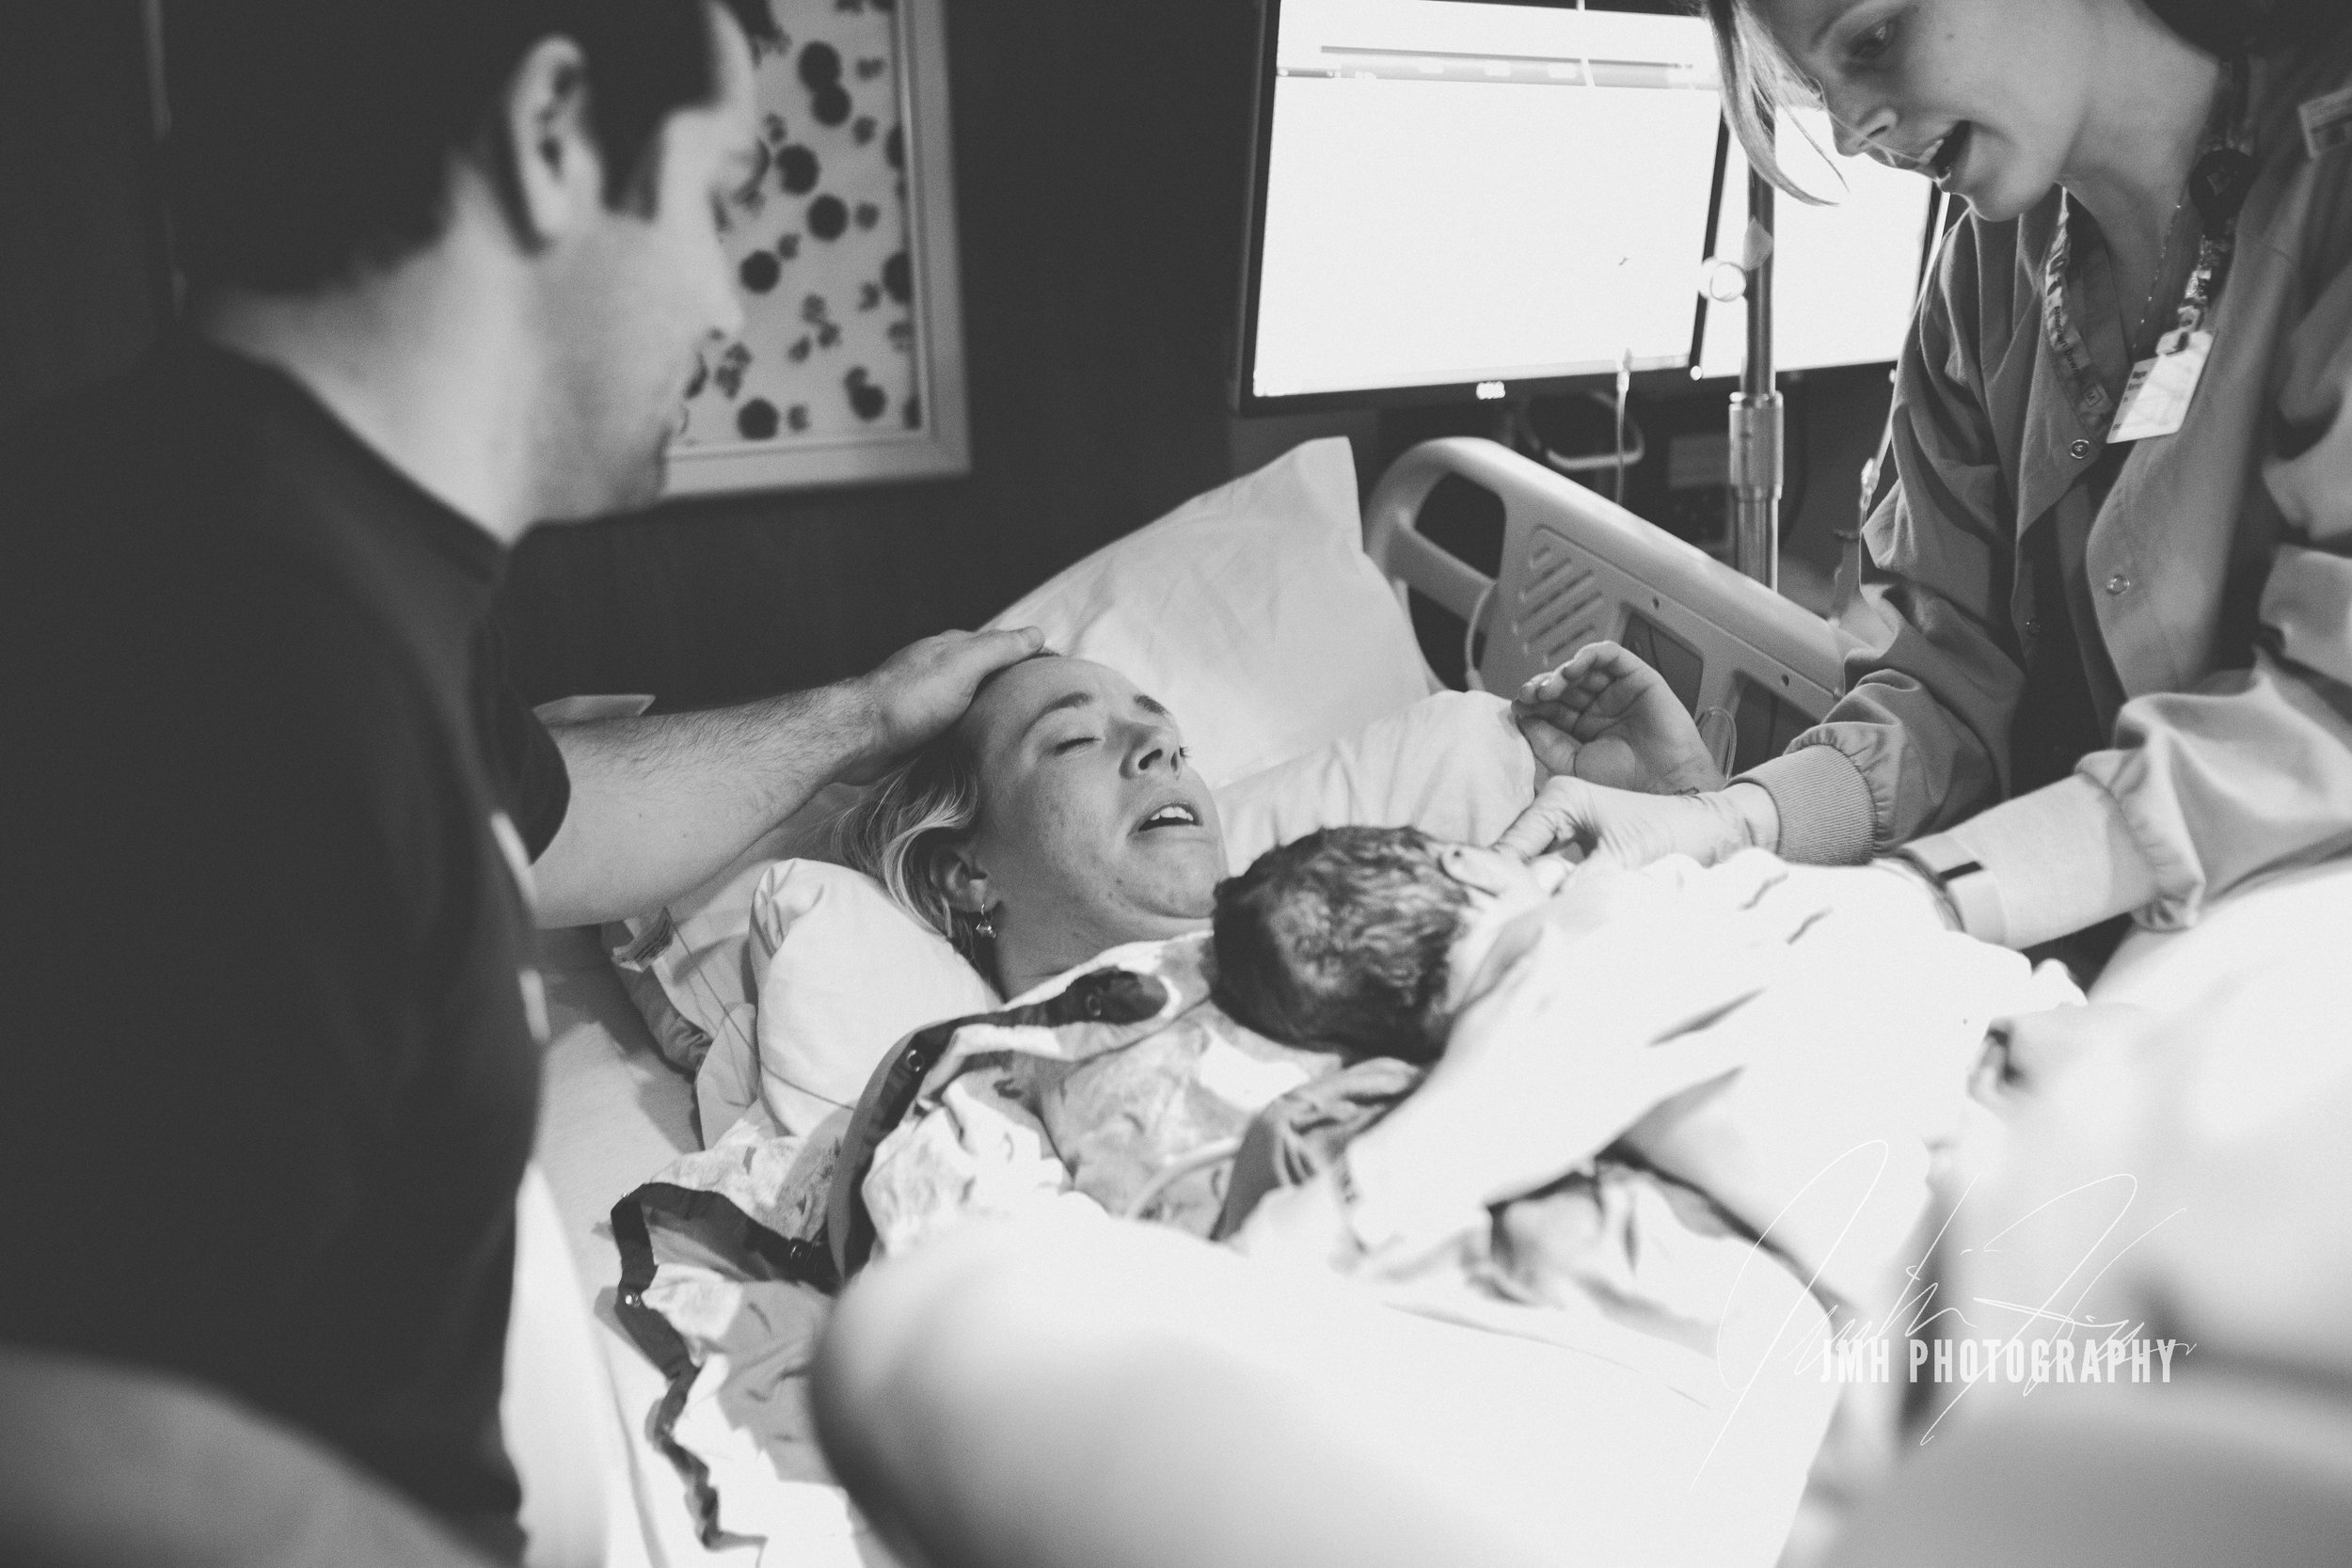 grandrapids_birth_photography-17.jpg